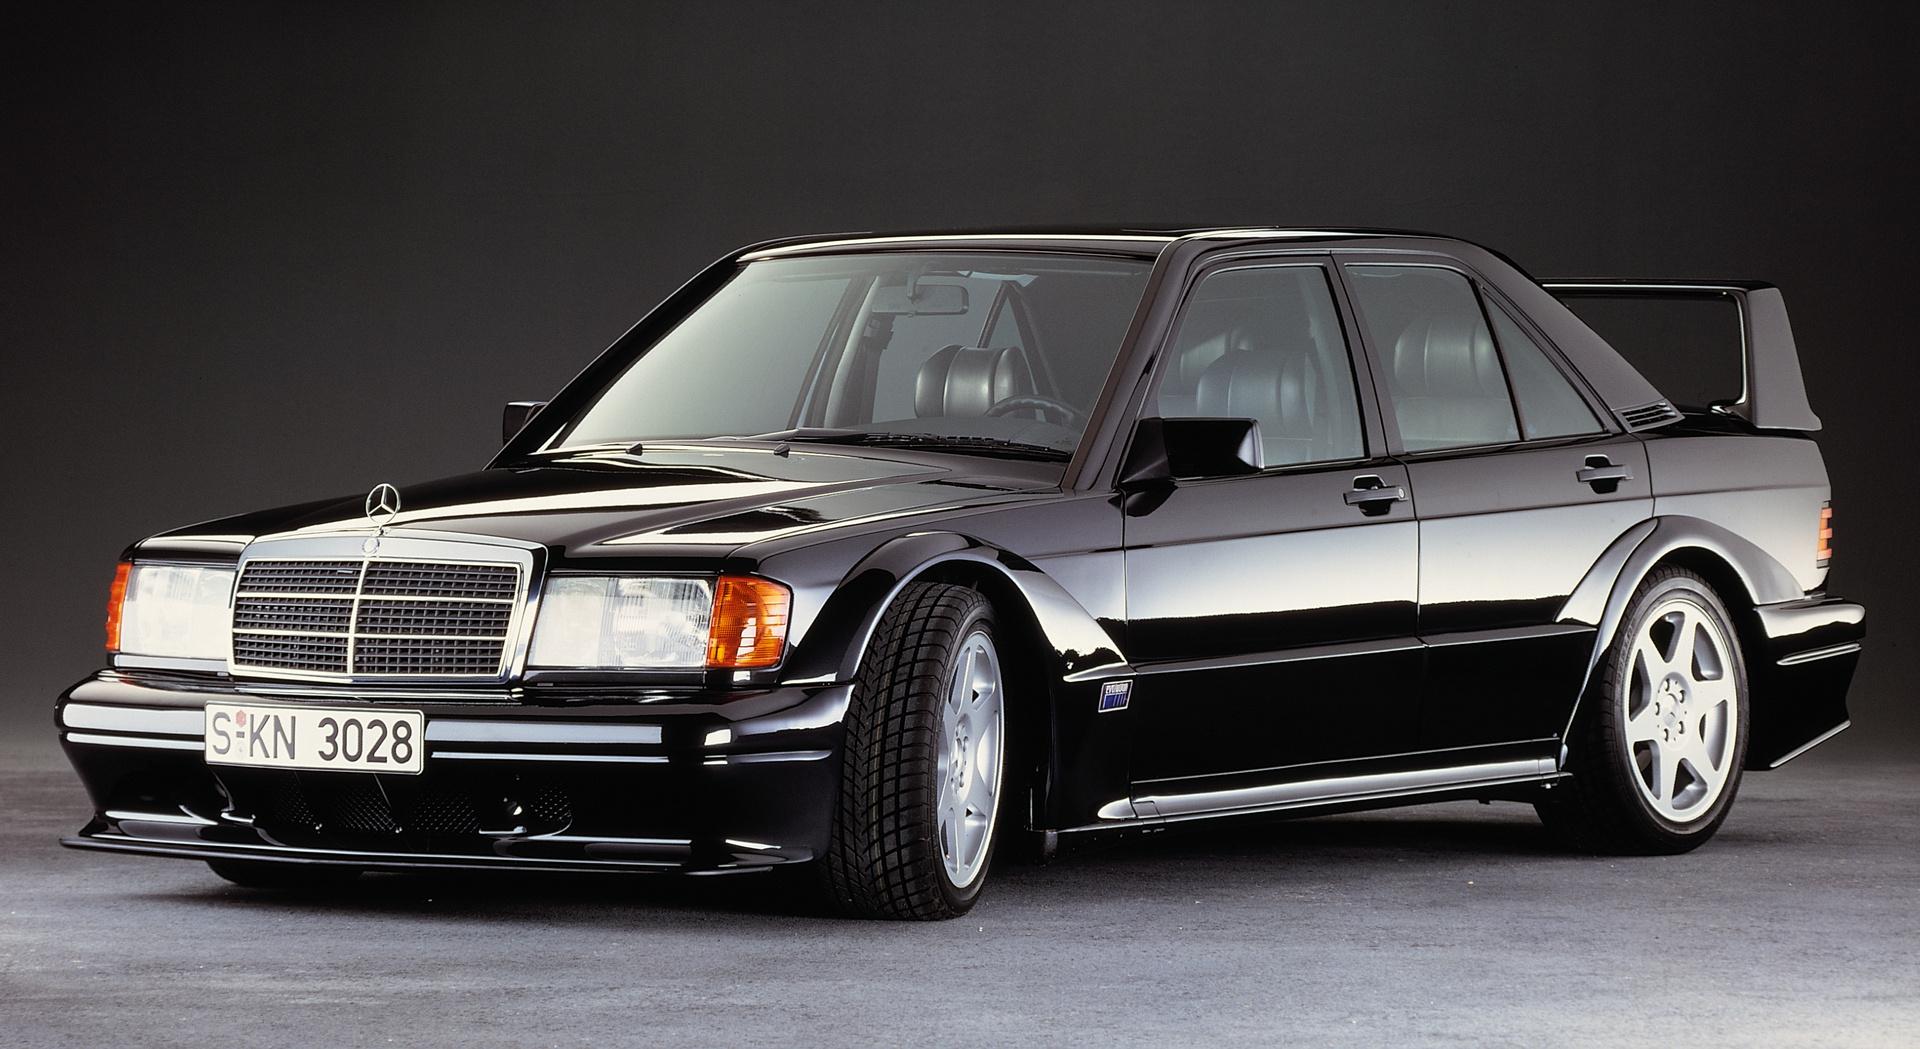 Mercedes 190 E 2.5-16 Evolution II